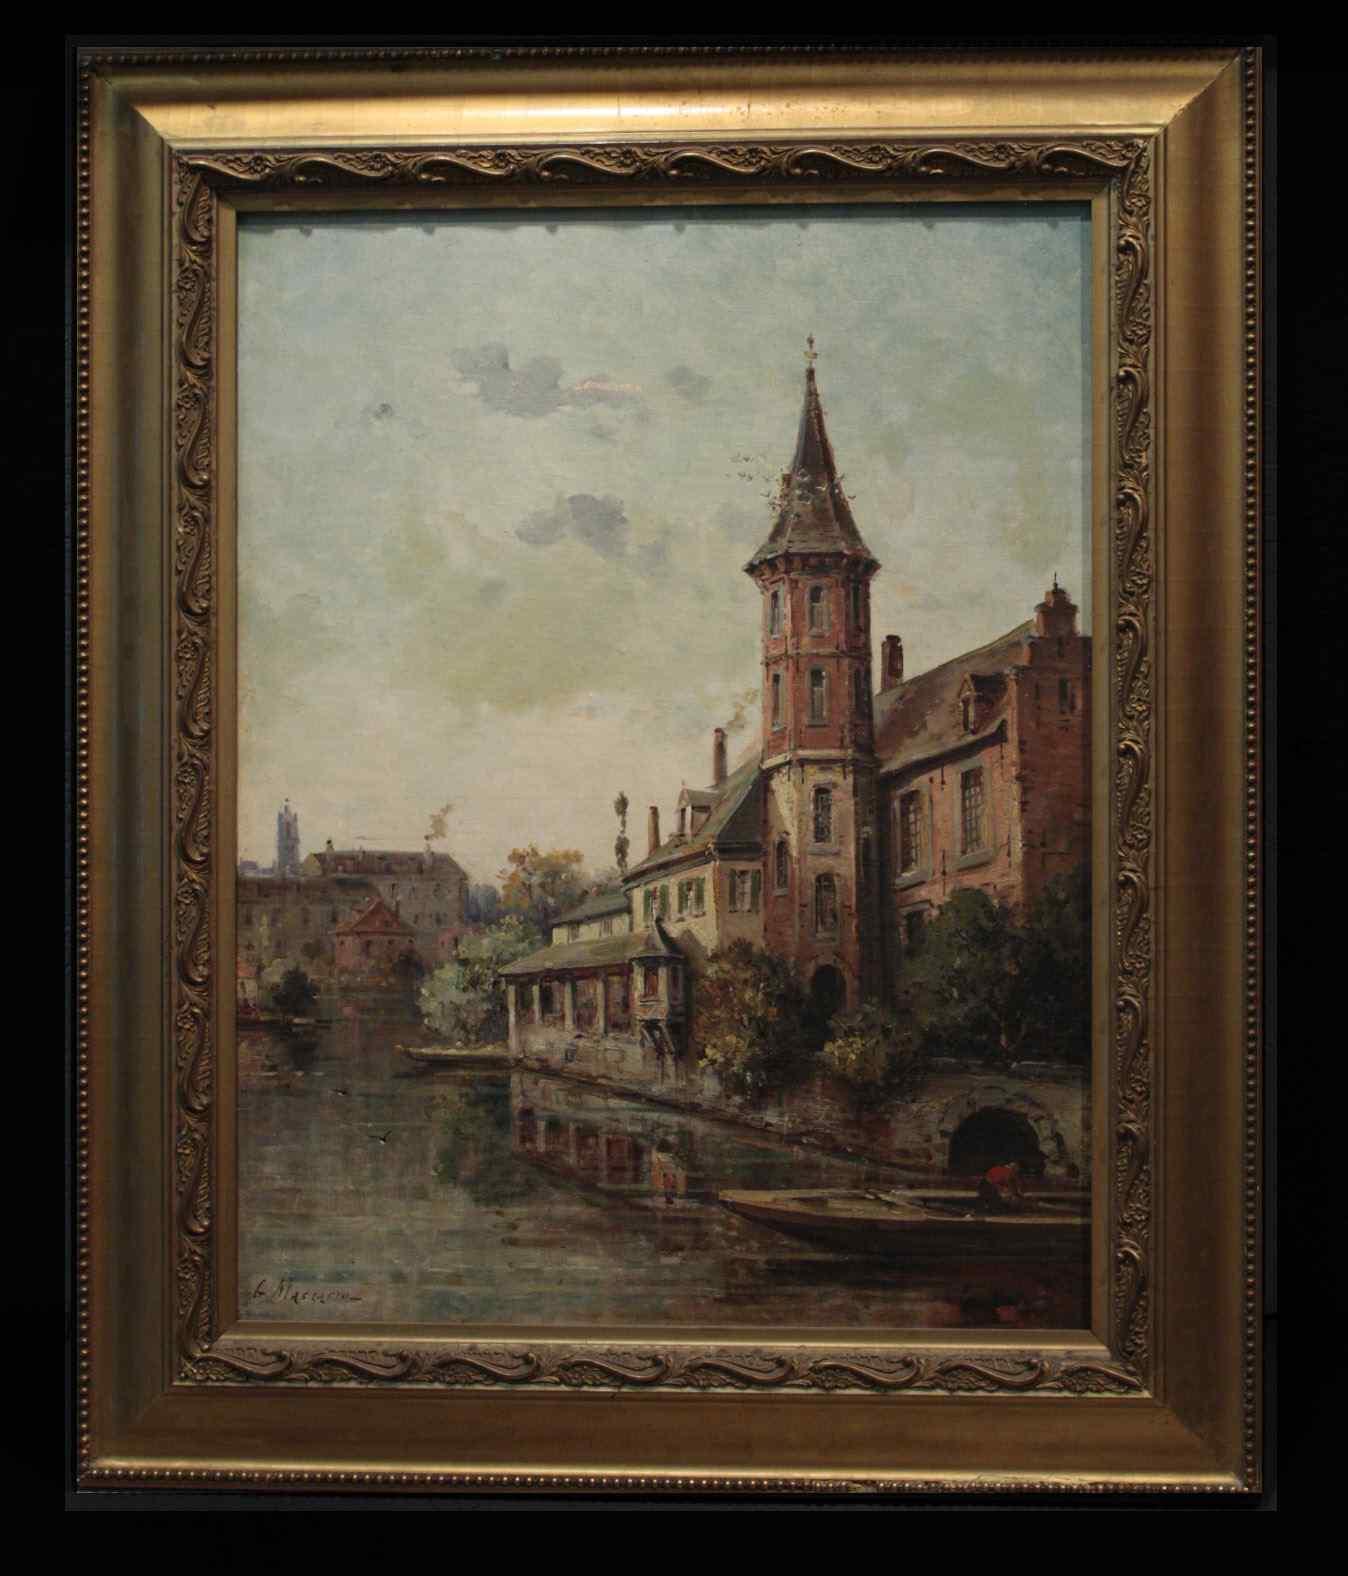 Giuseppe Mascarini (1877-1954) -Veduta di Pouilly-sur Loire